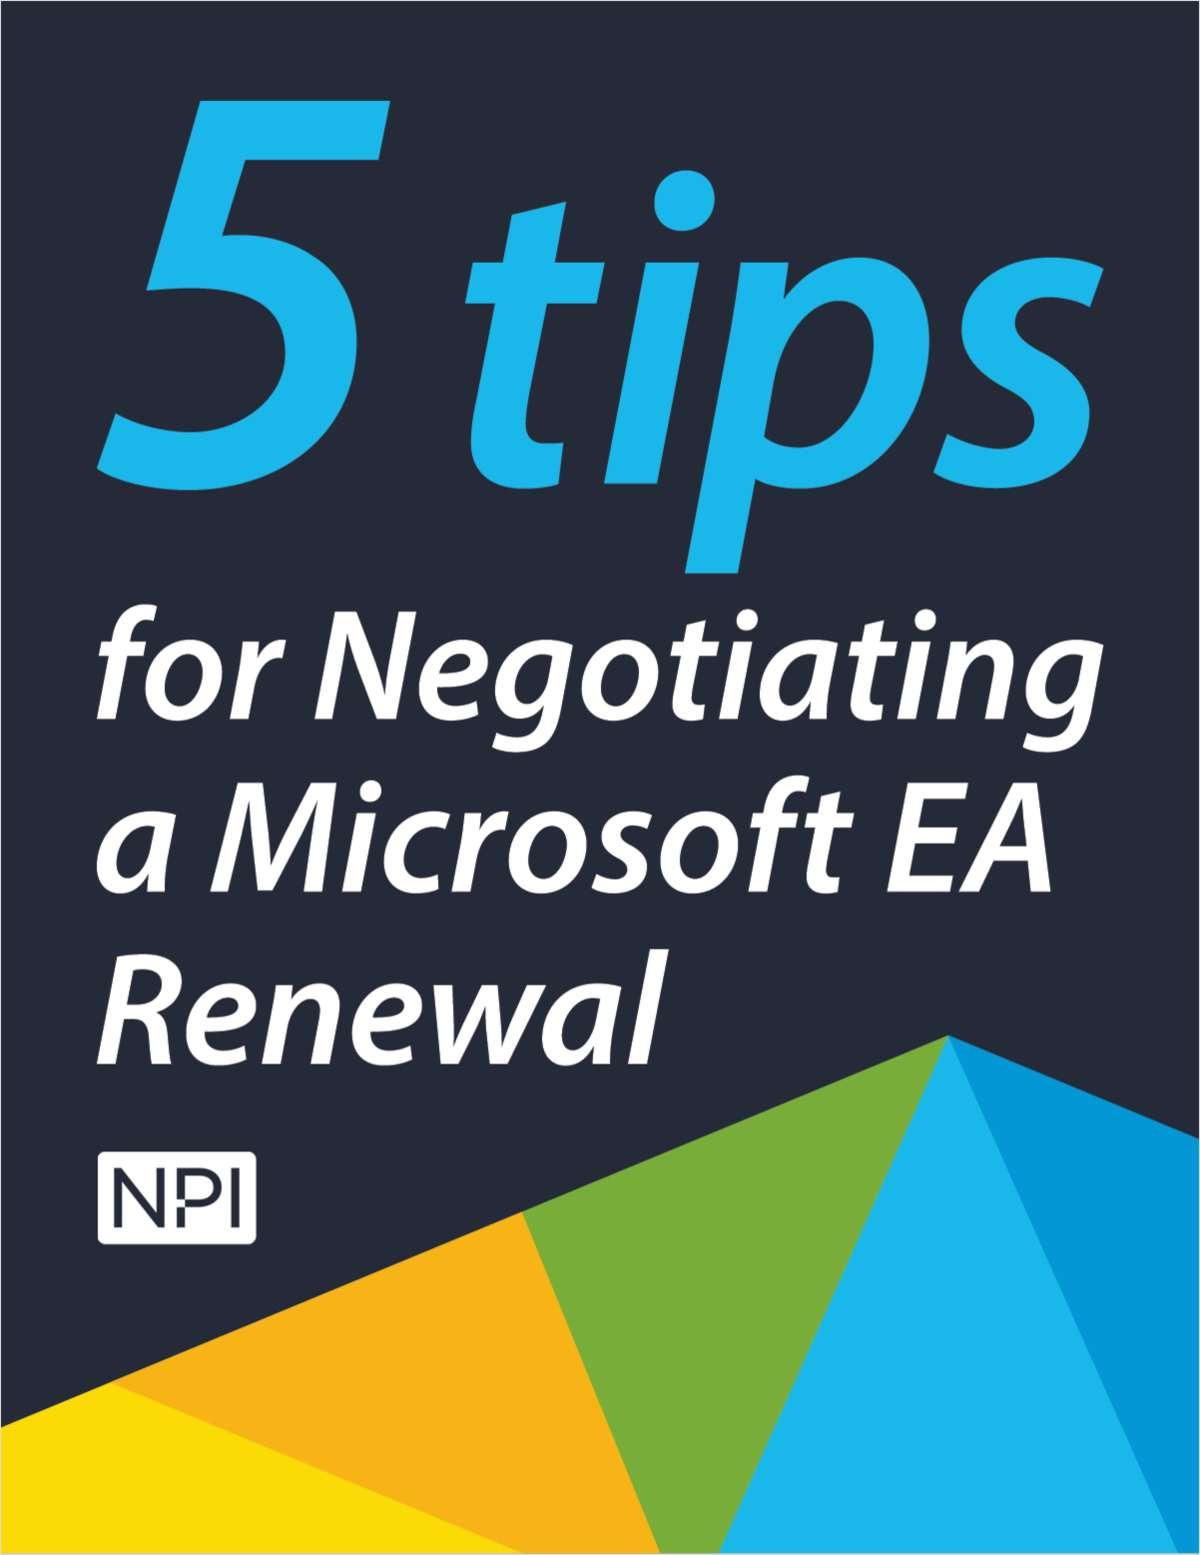 5 Tips for Negotiating a Microsoft Enterprise Agreement Renewal